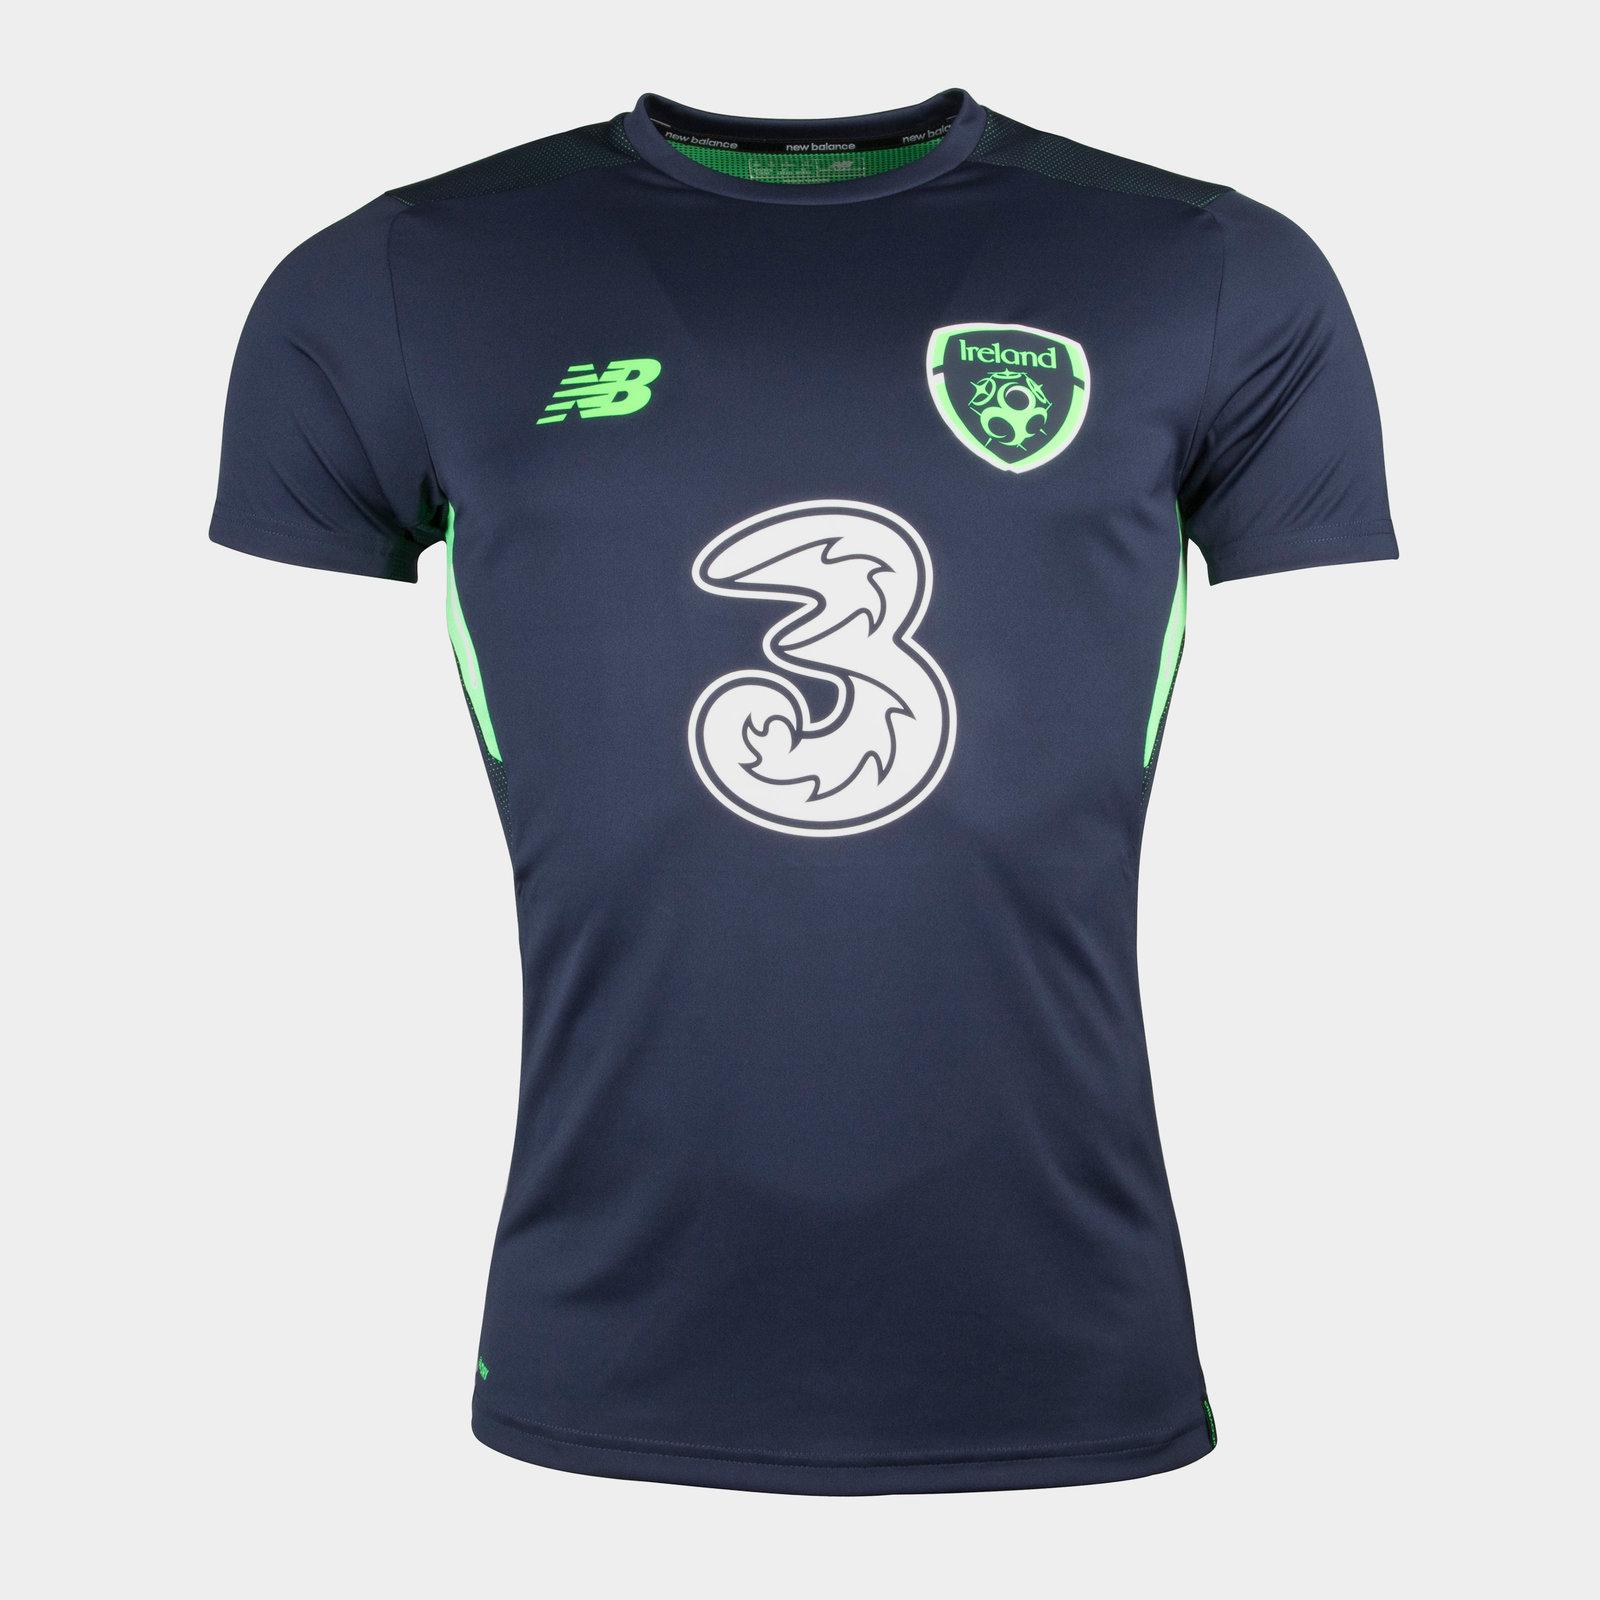 Image of Republic of Ireland 17/18 S/S Football Training Shirt